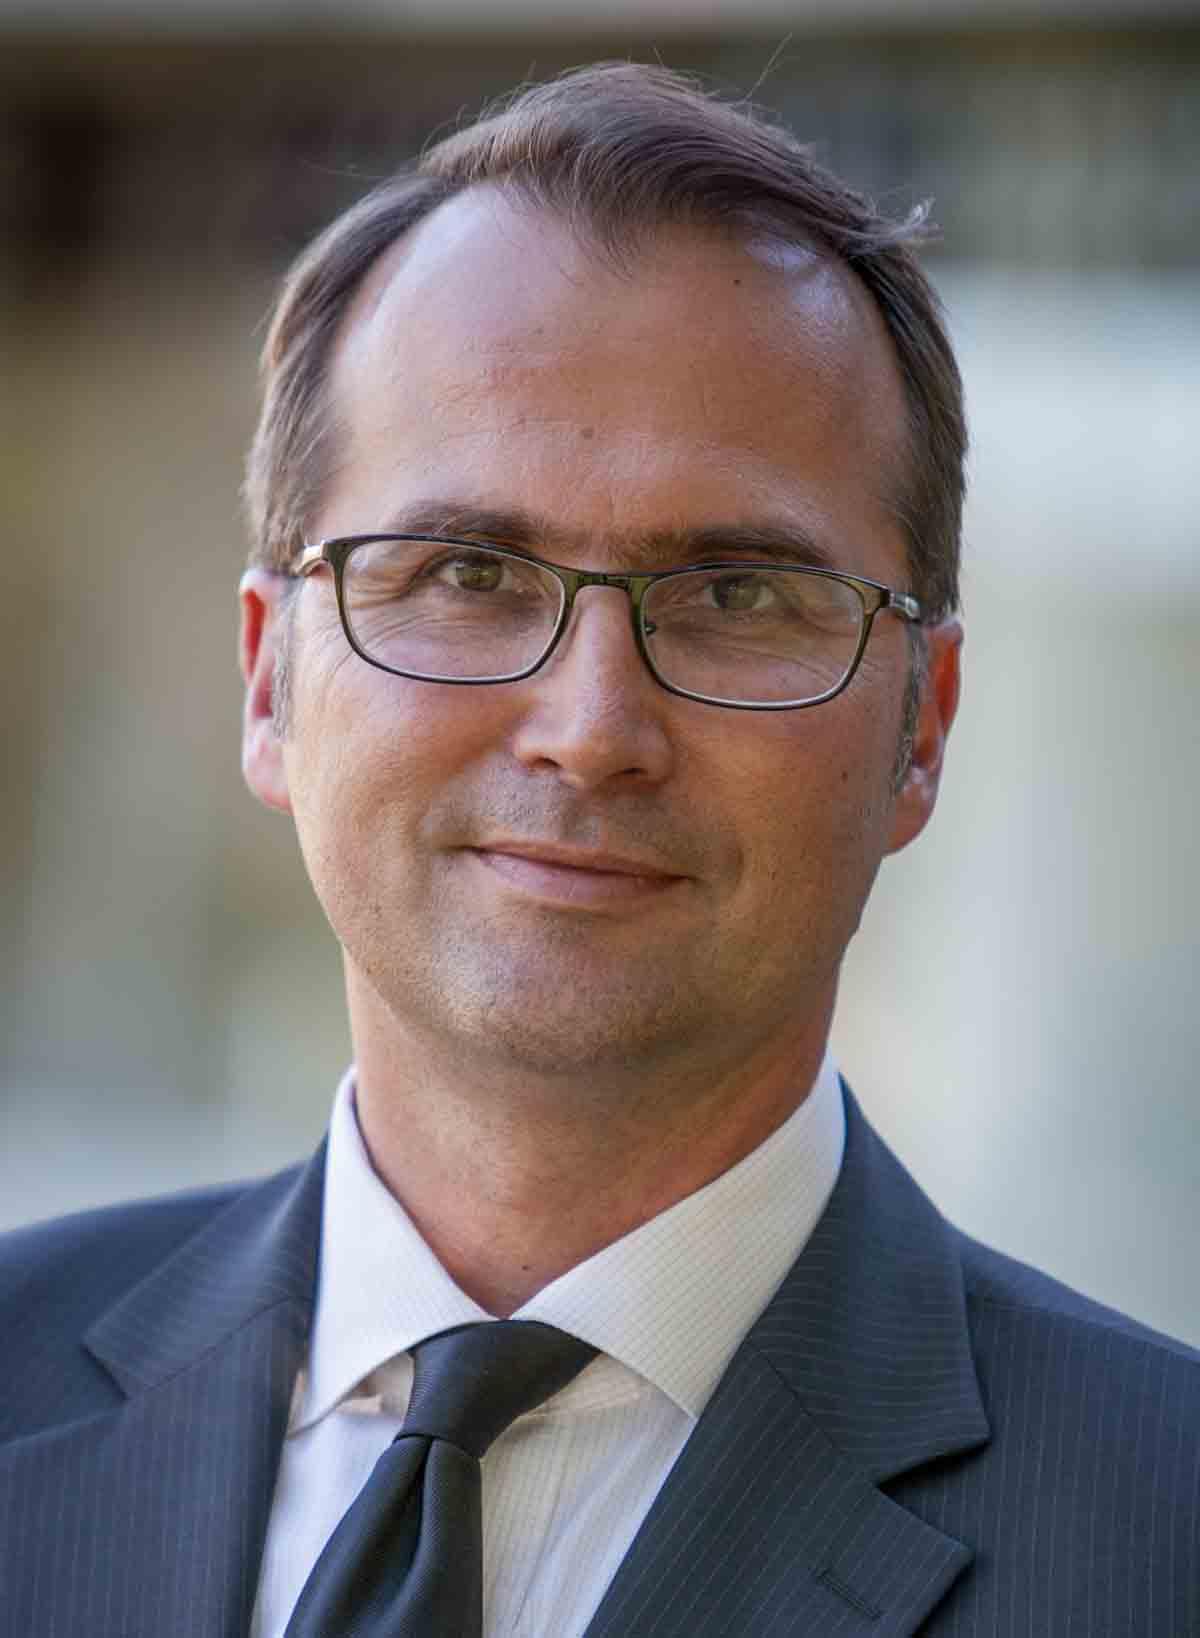 Dr. Gerhard Apfelthaler